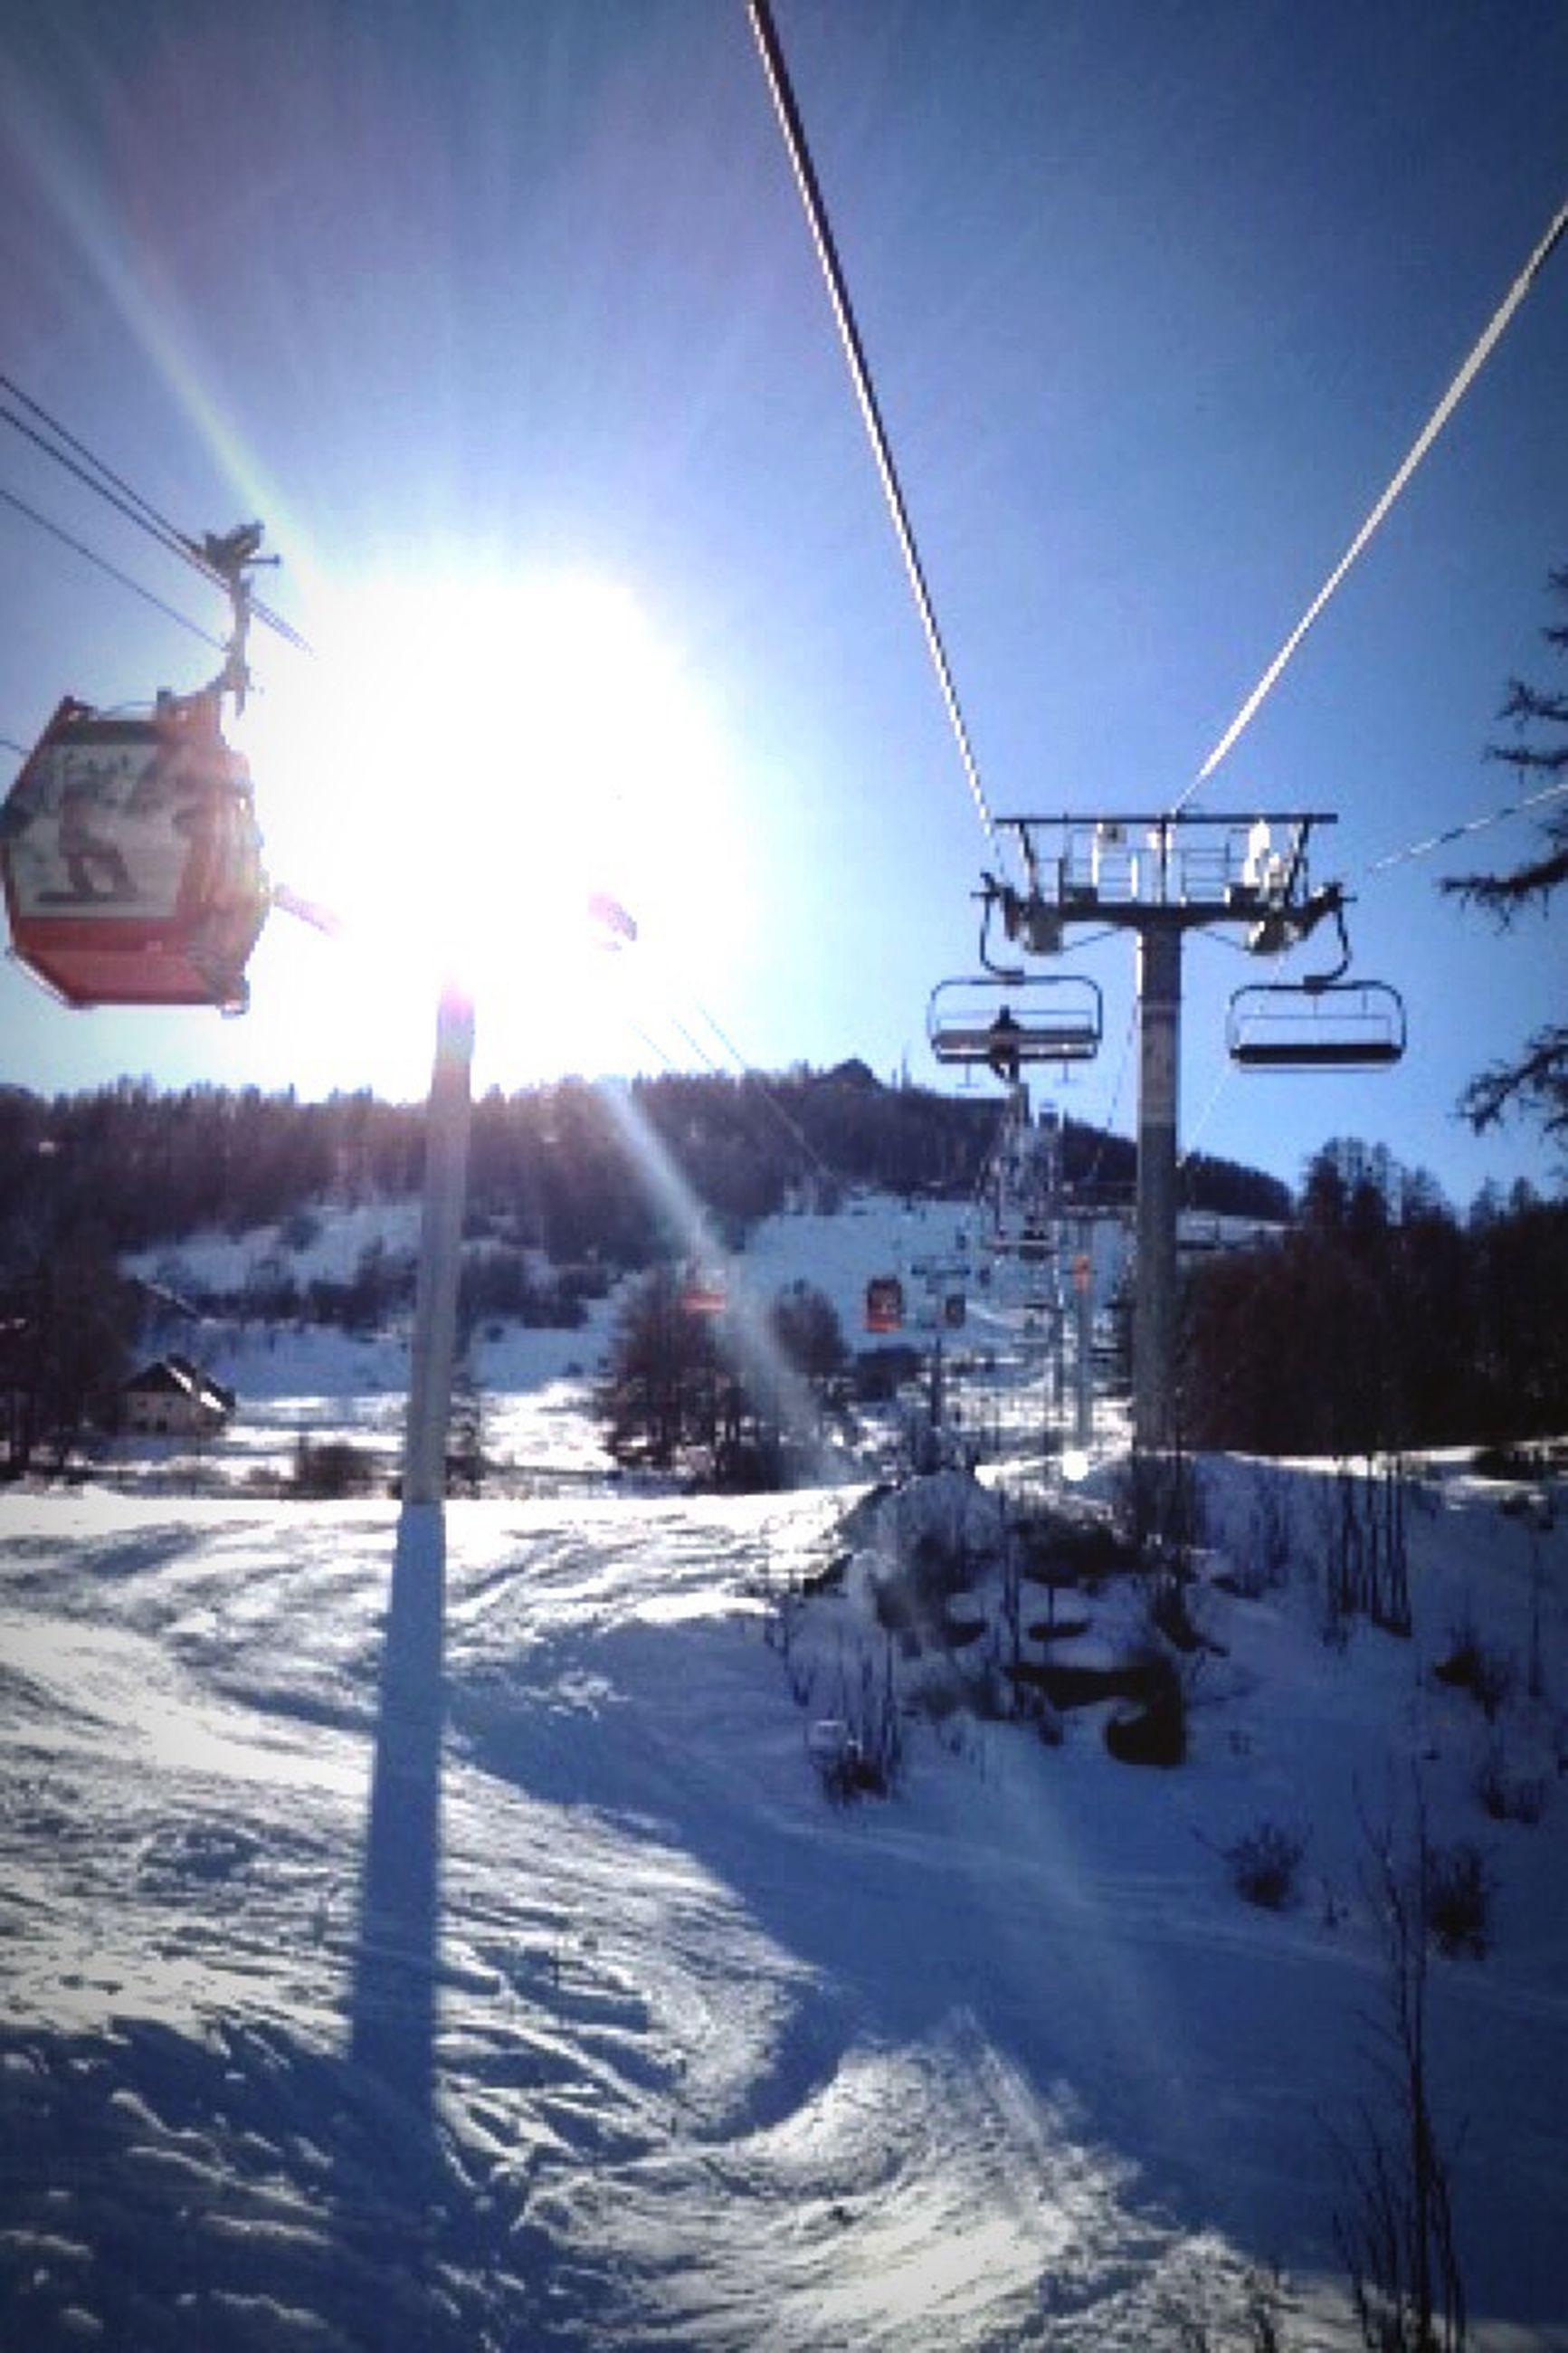 snow, winter, cold temperature, sun, season, sunbeam, sunlight, transportation, weather, lens flare, mode of transport, covering, clear sky, ski lift, sky, nature, bright, sunny, frozen, white color